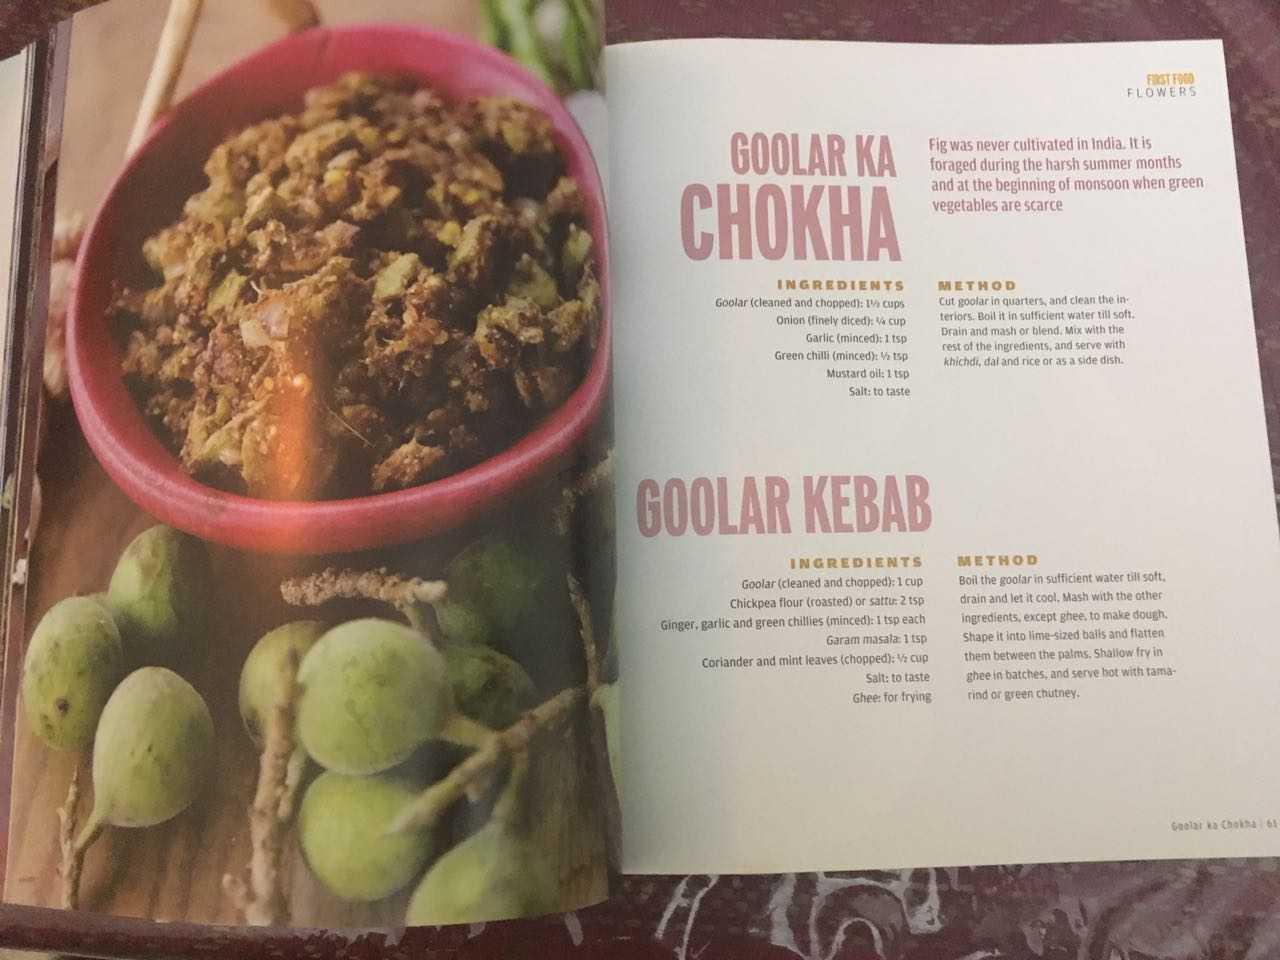 Chokha-fnbworld-nazuk ahluwalia